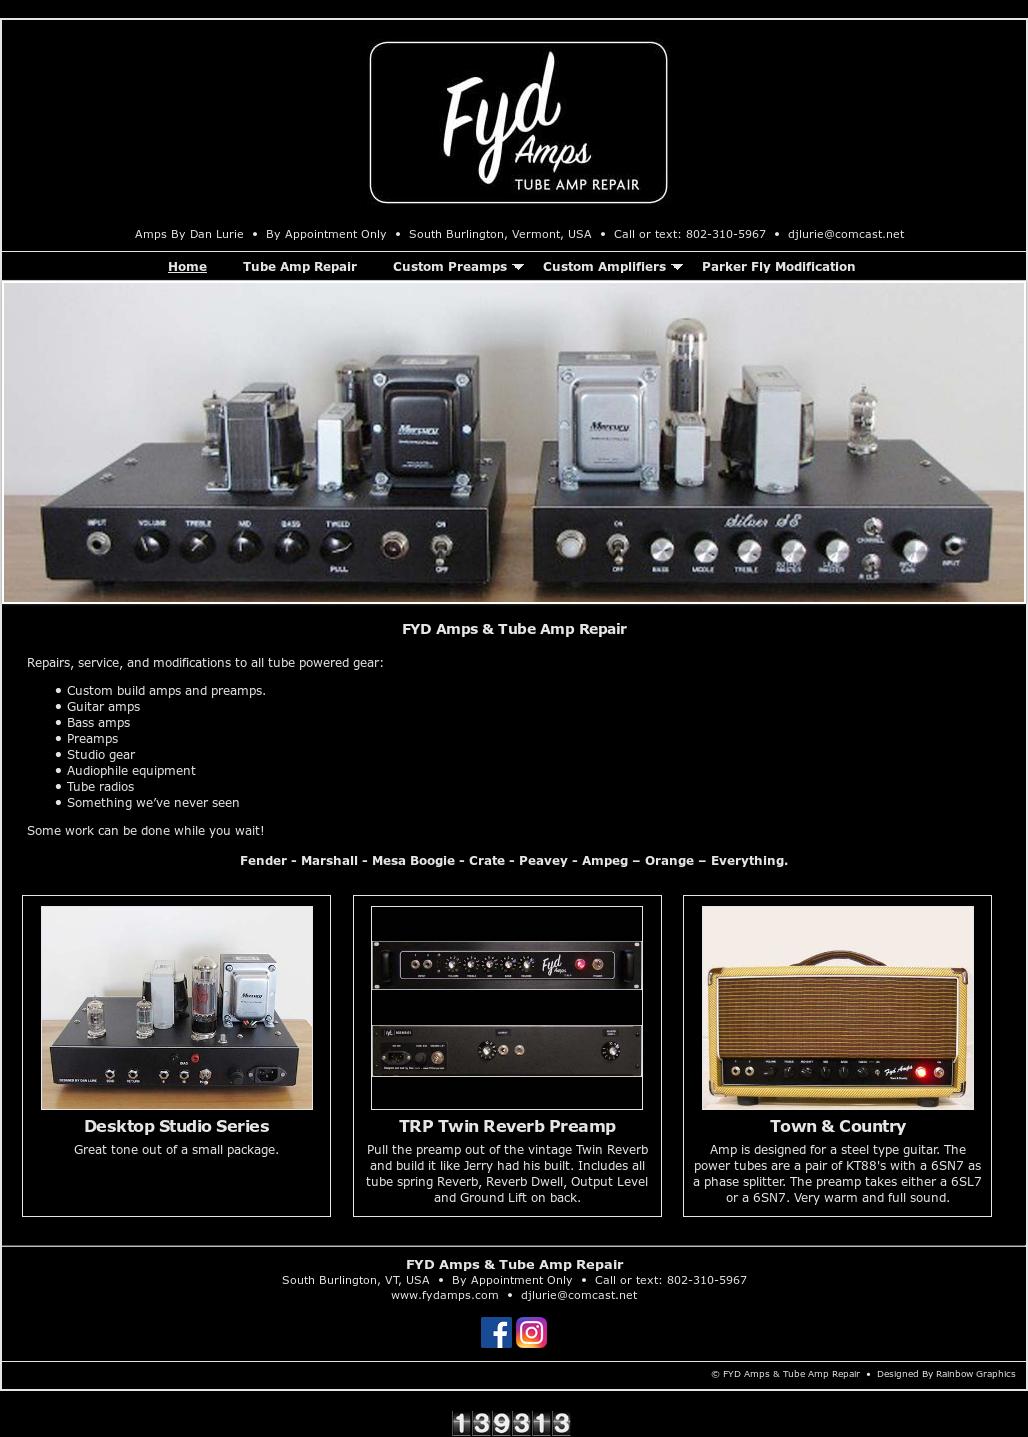 Tube Amp Repair (Fyd Amps) Competitors, Revenue and